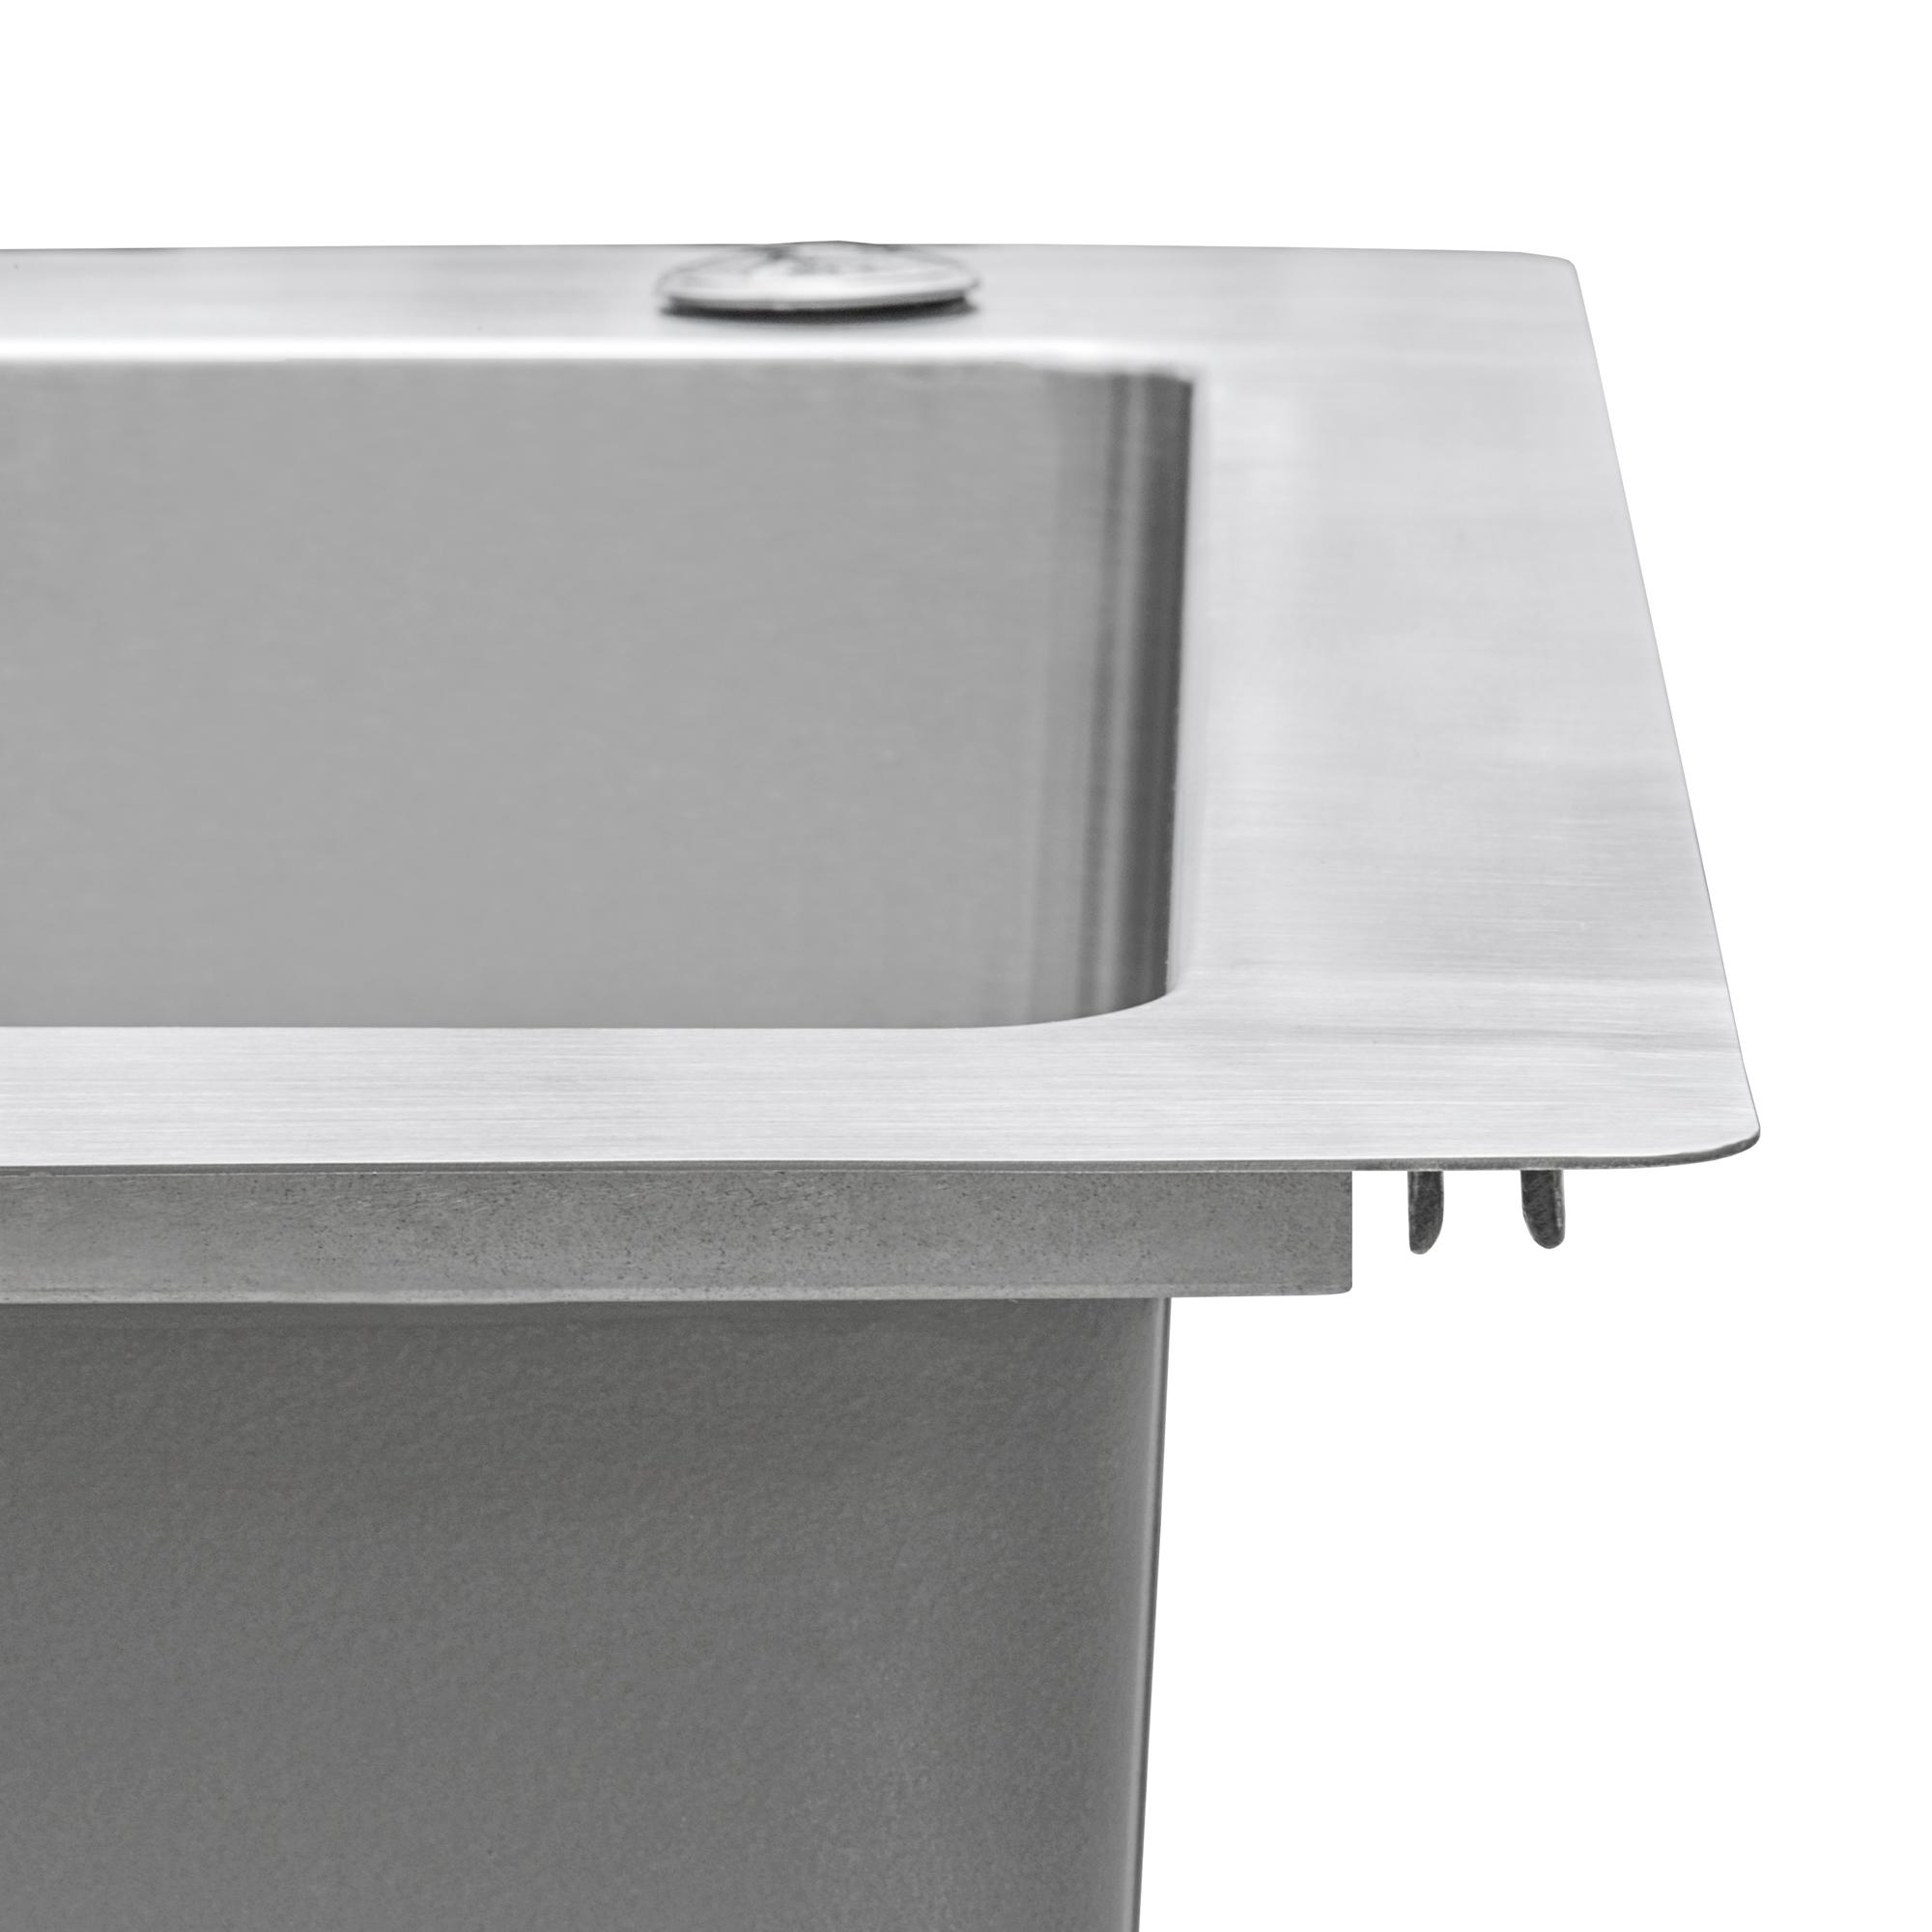 Picture of: Ruvati 33 X 22 Inch Drop In Topmount Kitchen Sink 16 Gauge Stainless Steel 70 30 Double Bowl Rvm5173